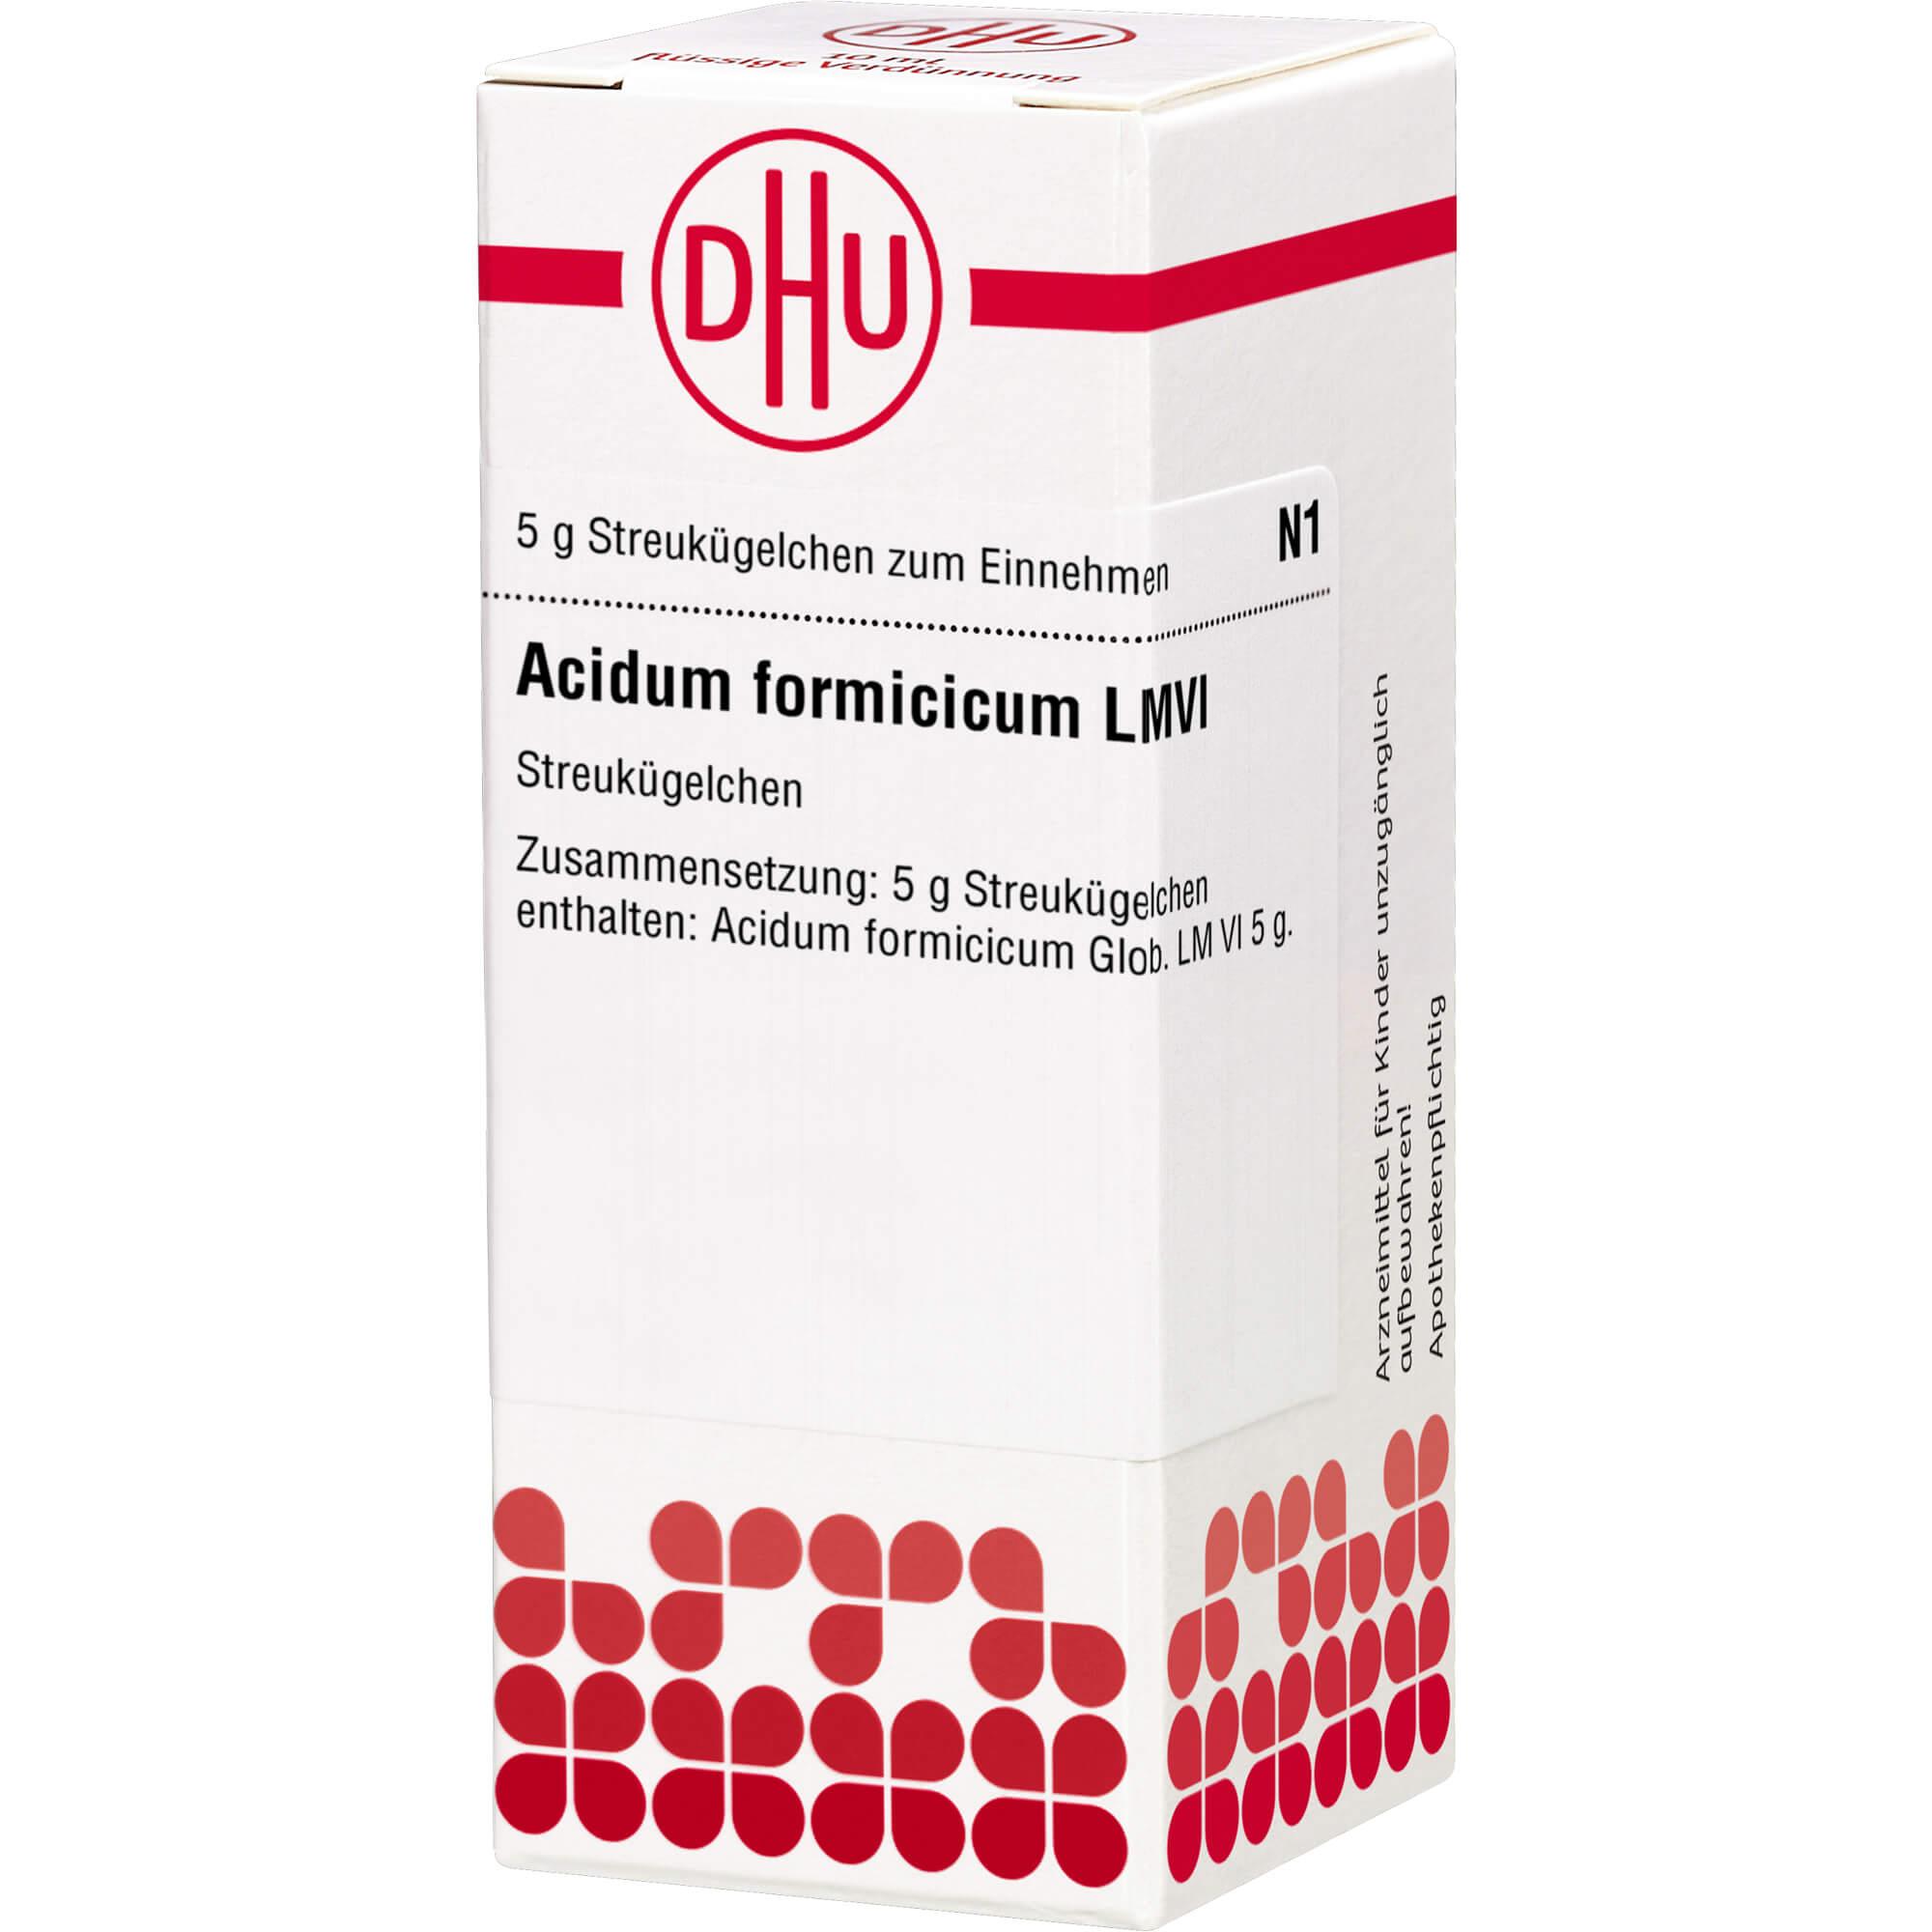 LM ACIDUM formicicum VI Globuli